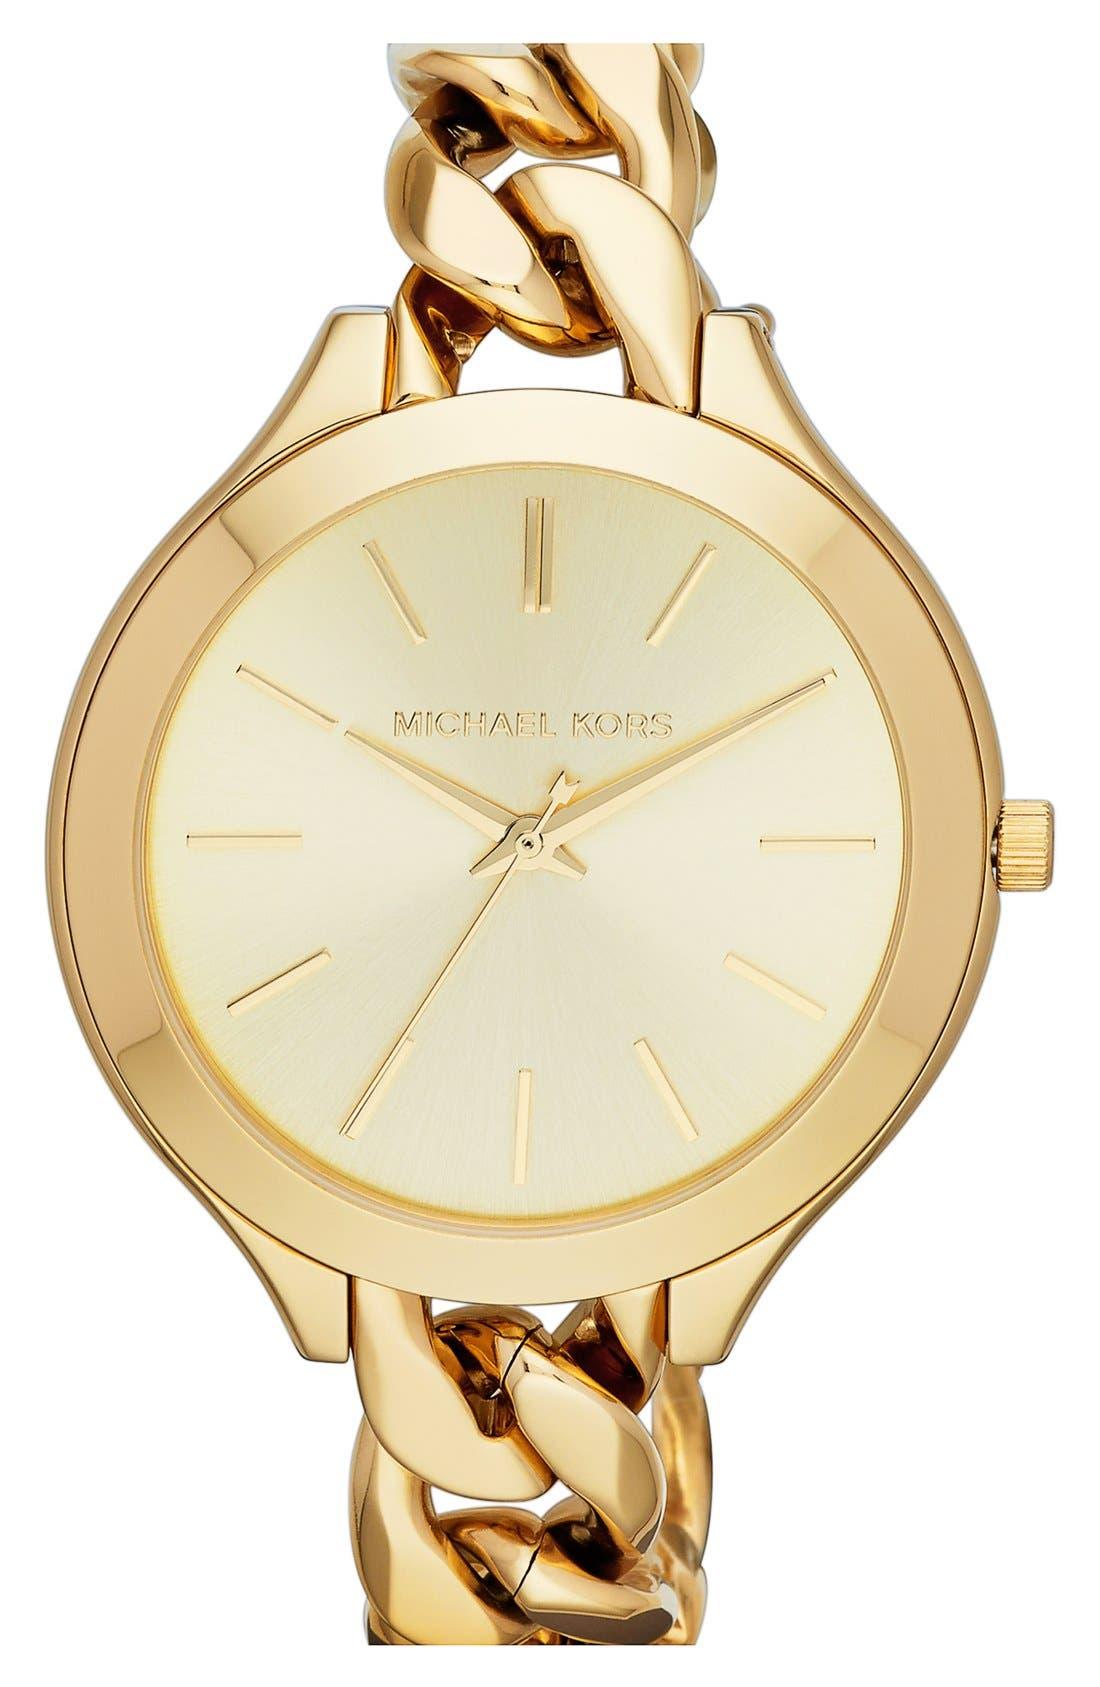 Main Image - Michael Kors 'Slim Runway' Chain Bracelet Watch, 42mm